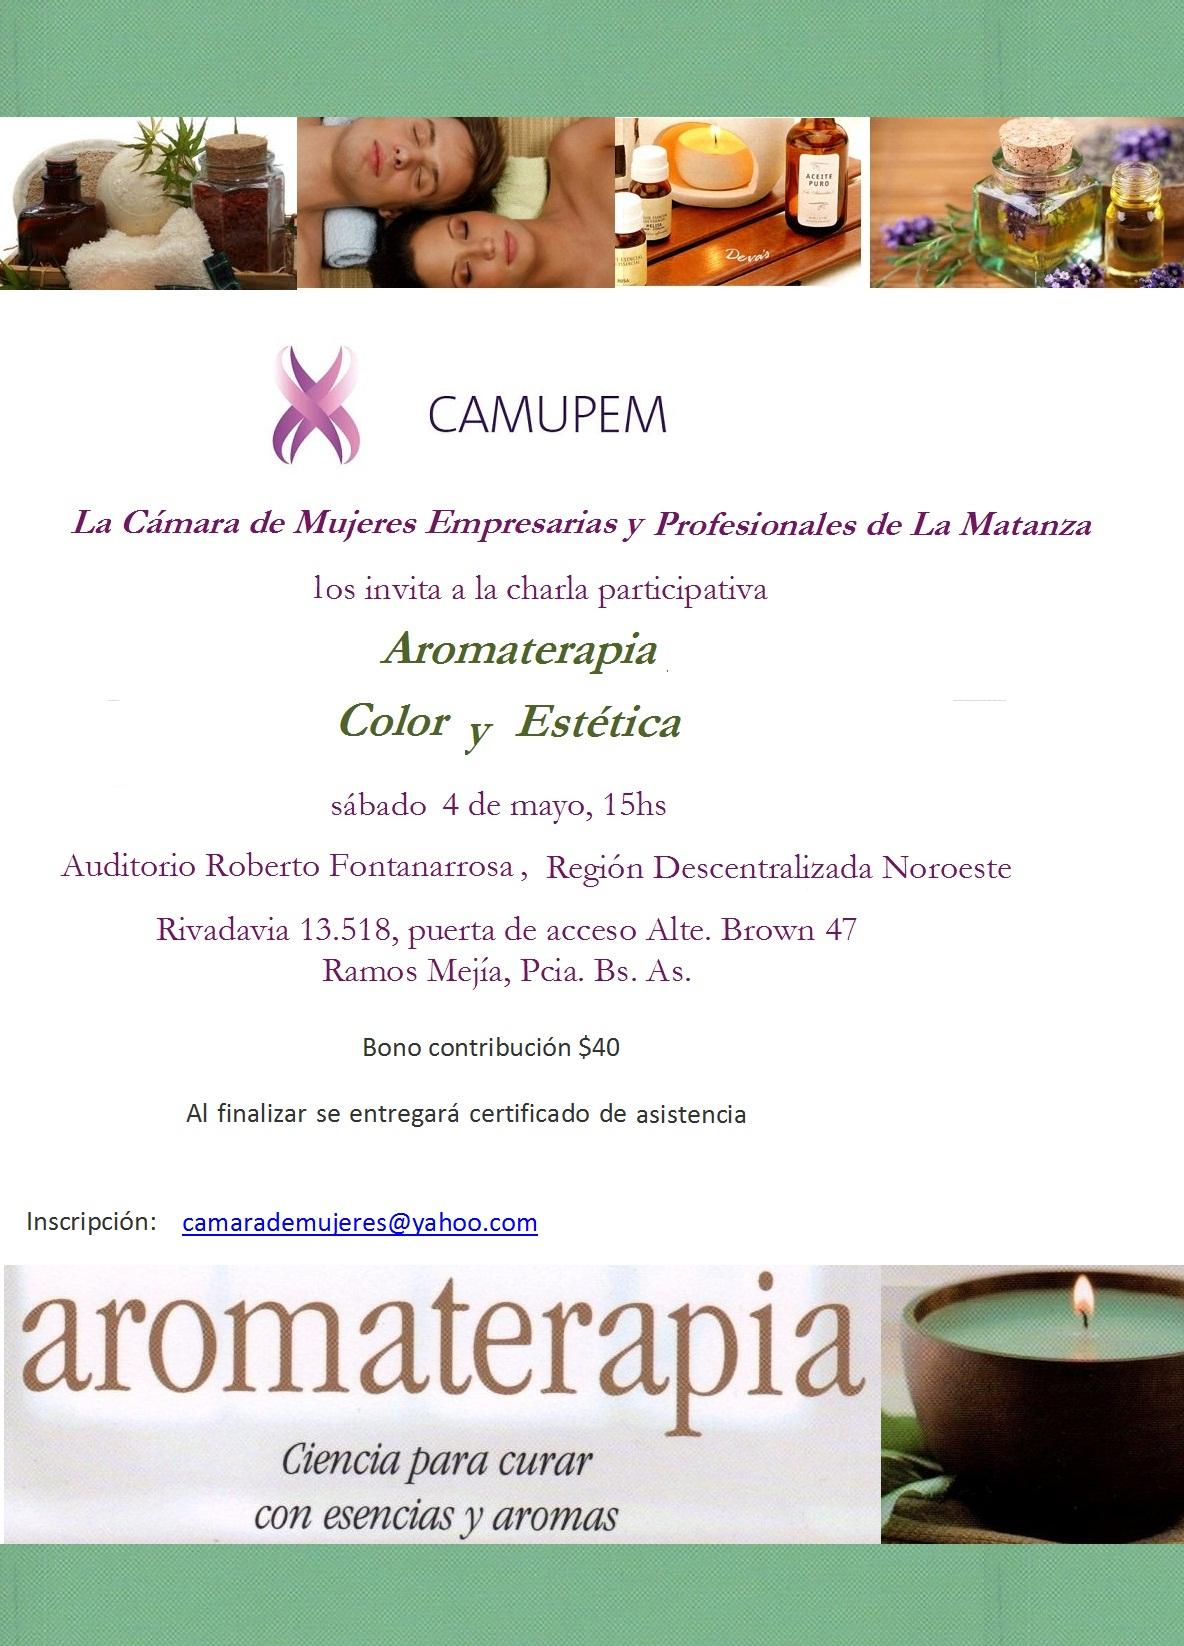 Aromaterapia, Color y Estética